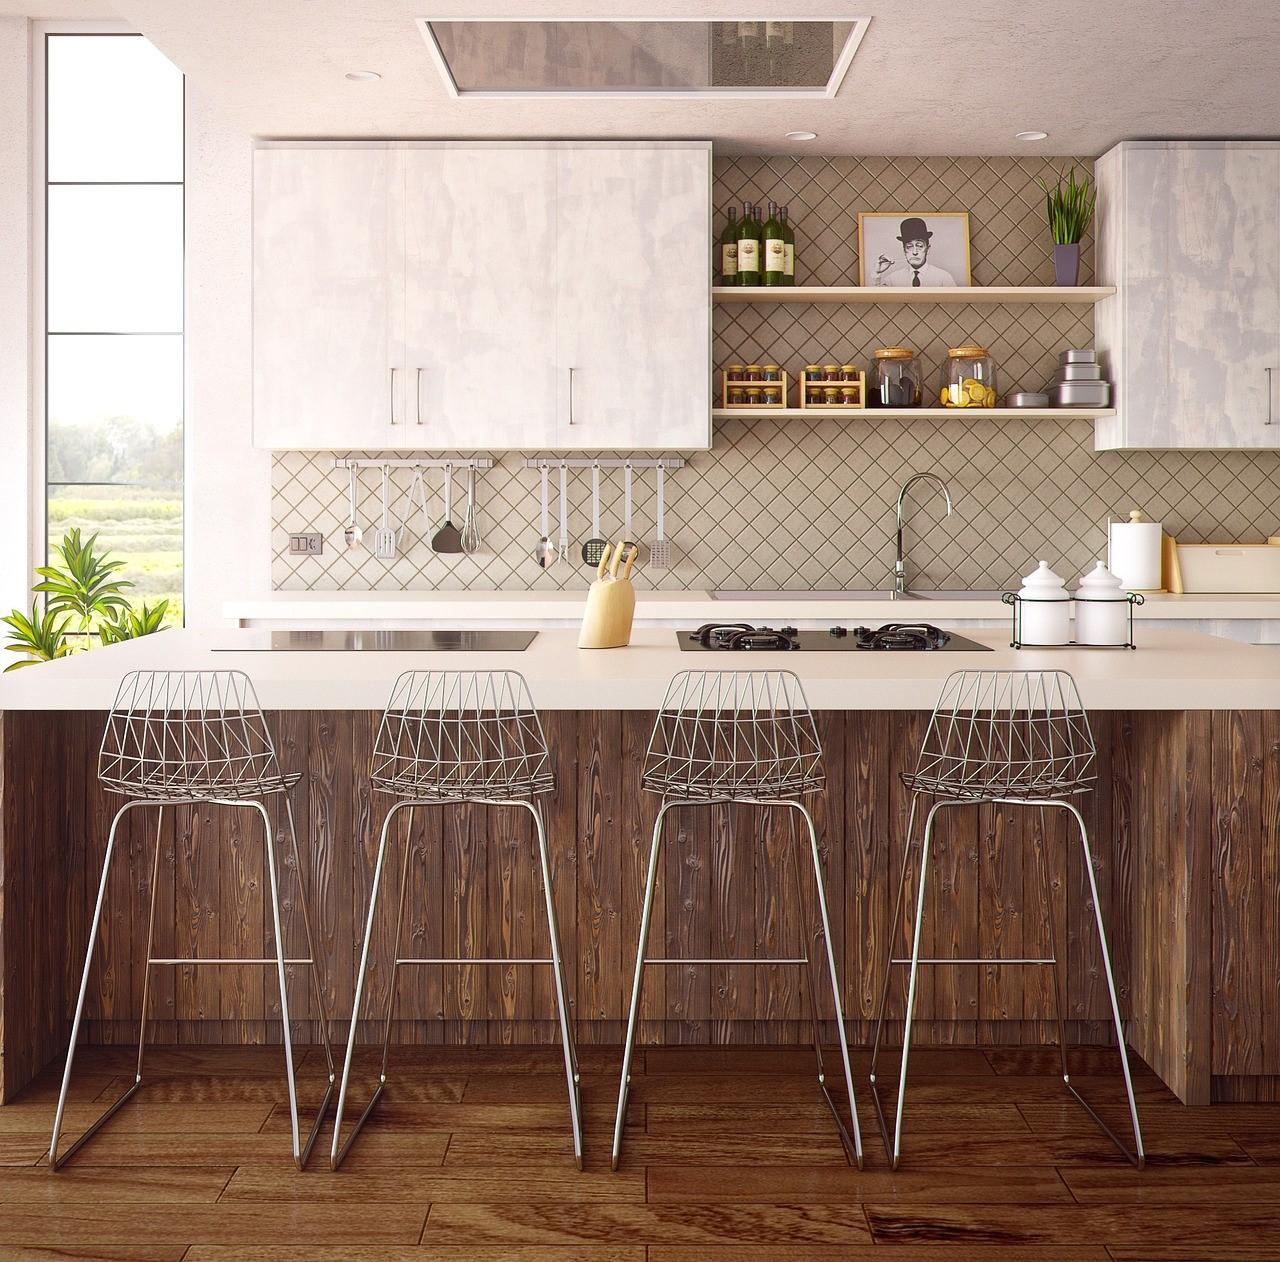 Kitchen Tiles Design Ideas To Cook Up A Storm Tiles Direct